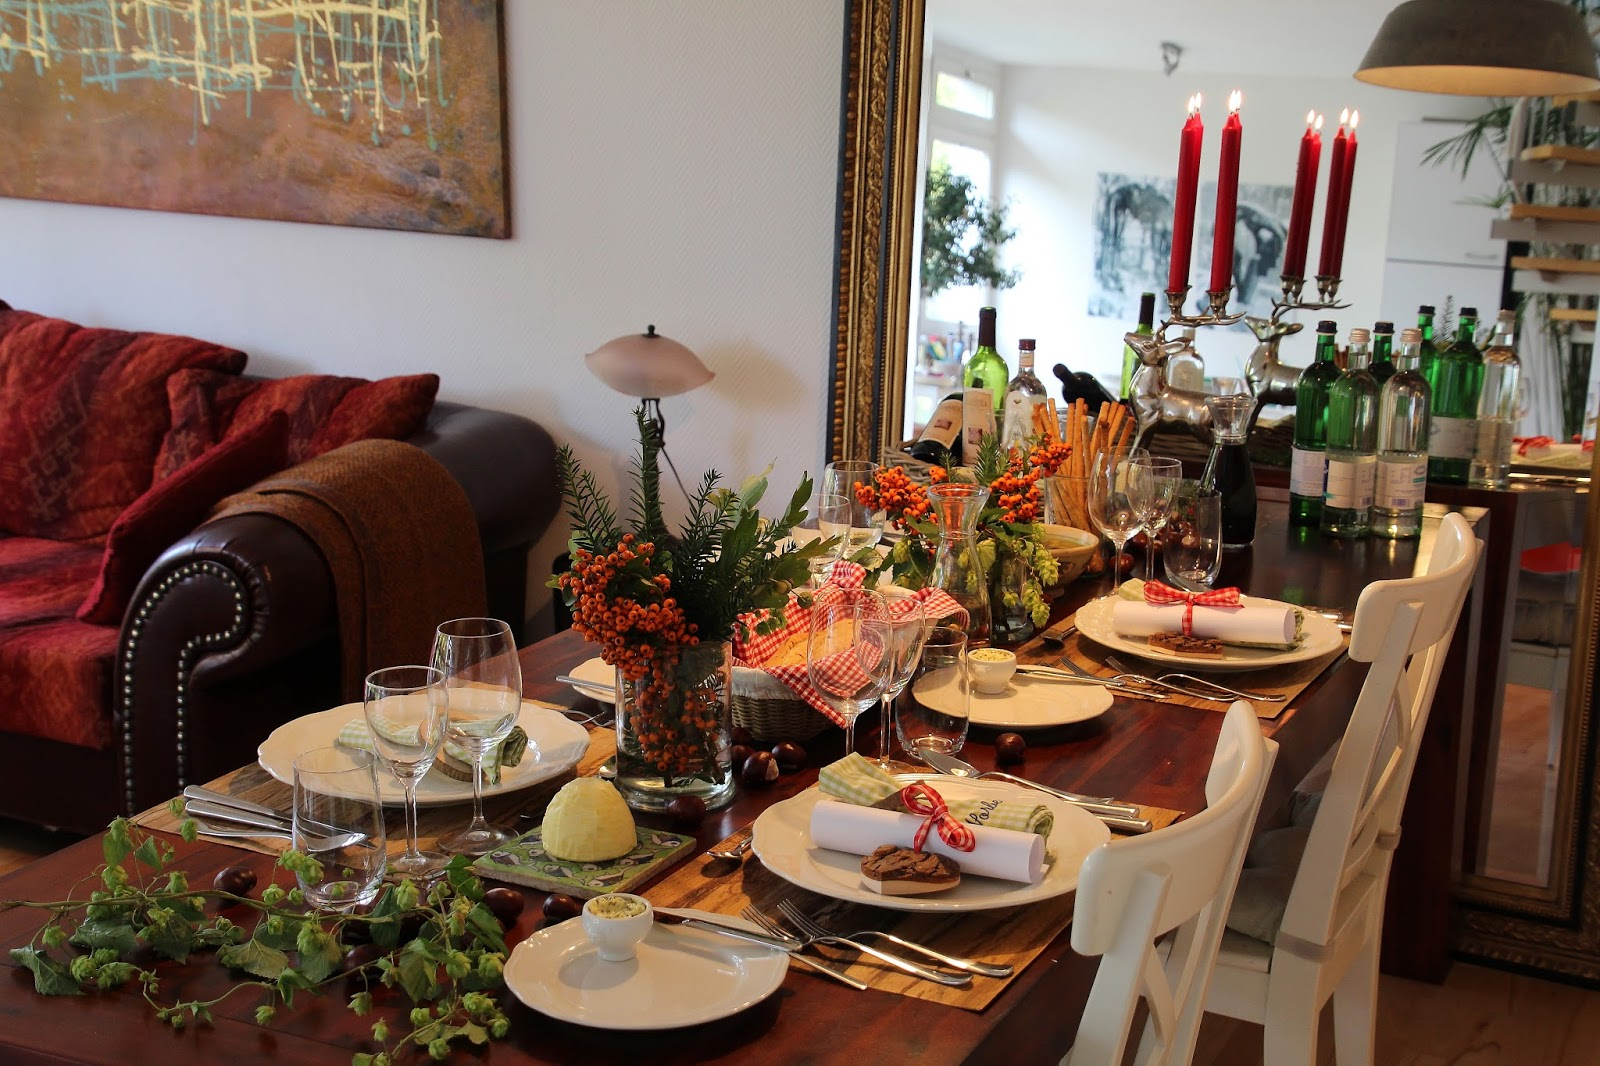 Stadtlandlebenslust herbstliche tischdeko Tischdeko im januar